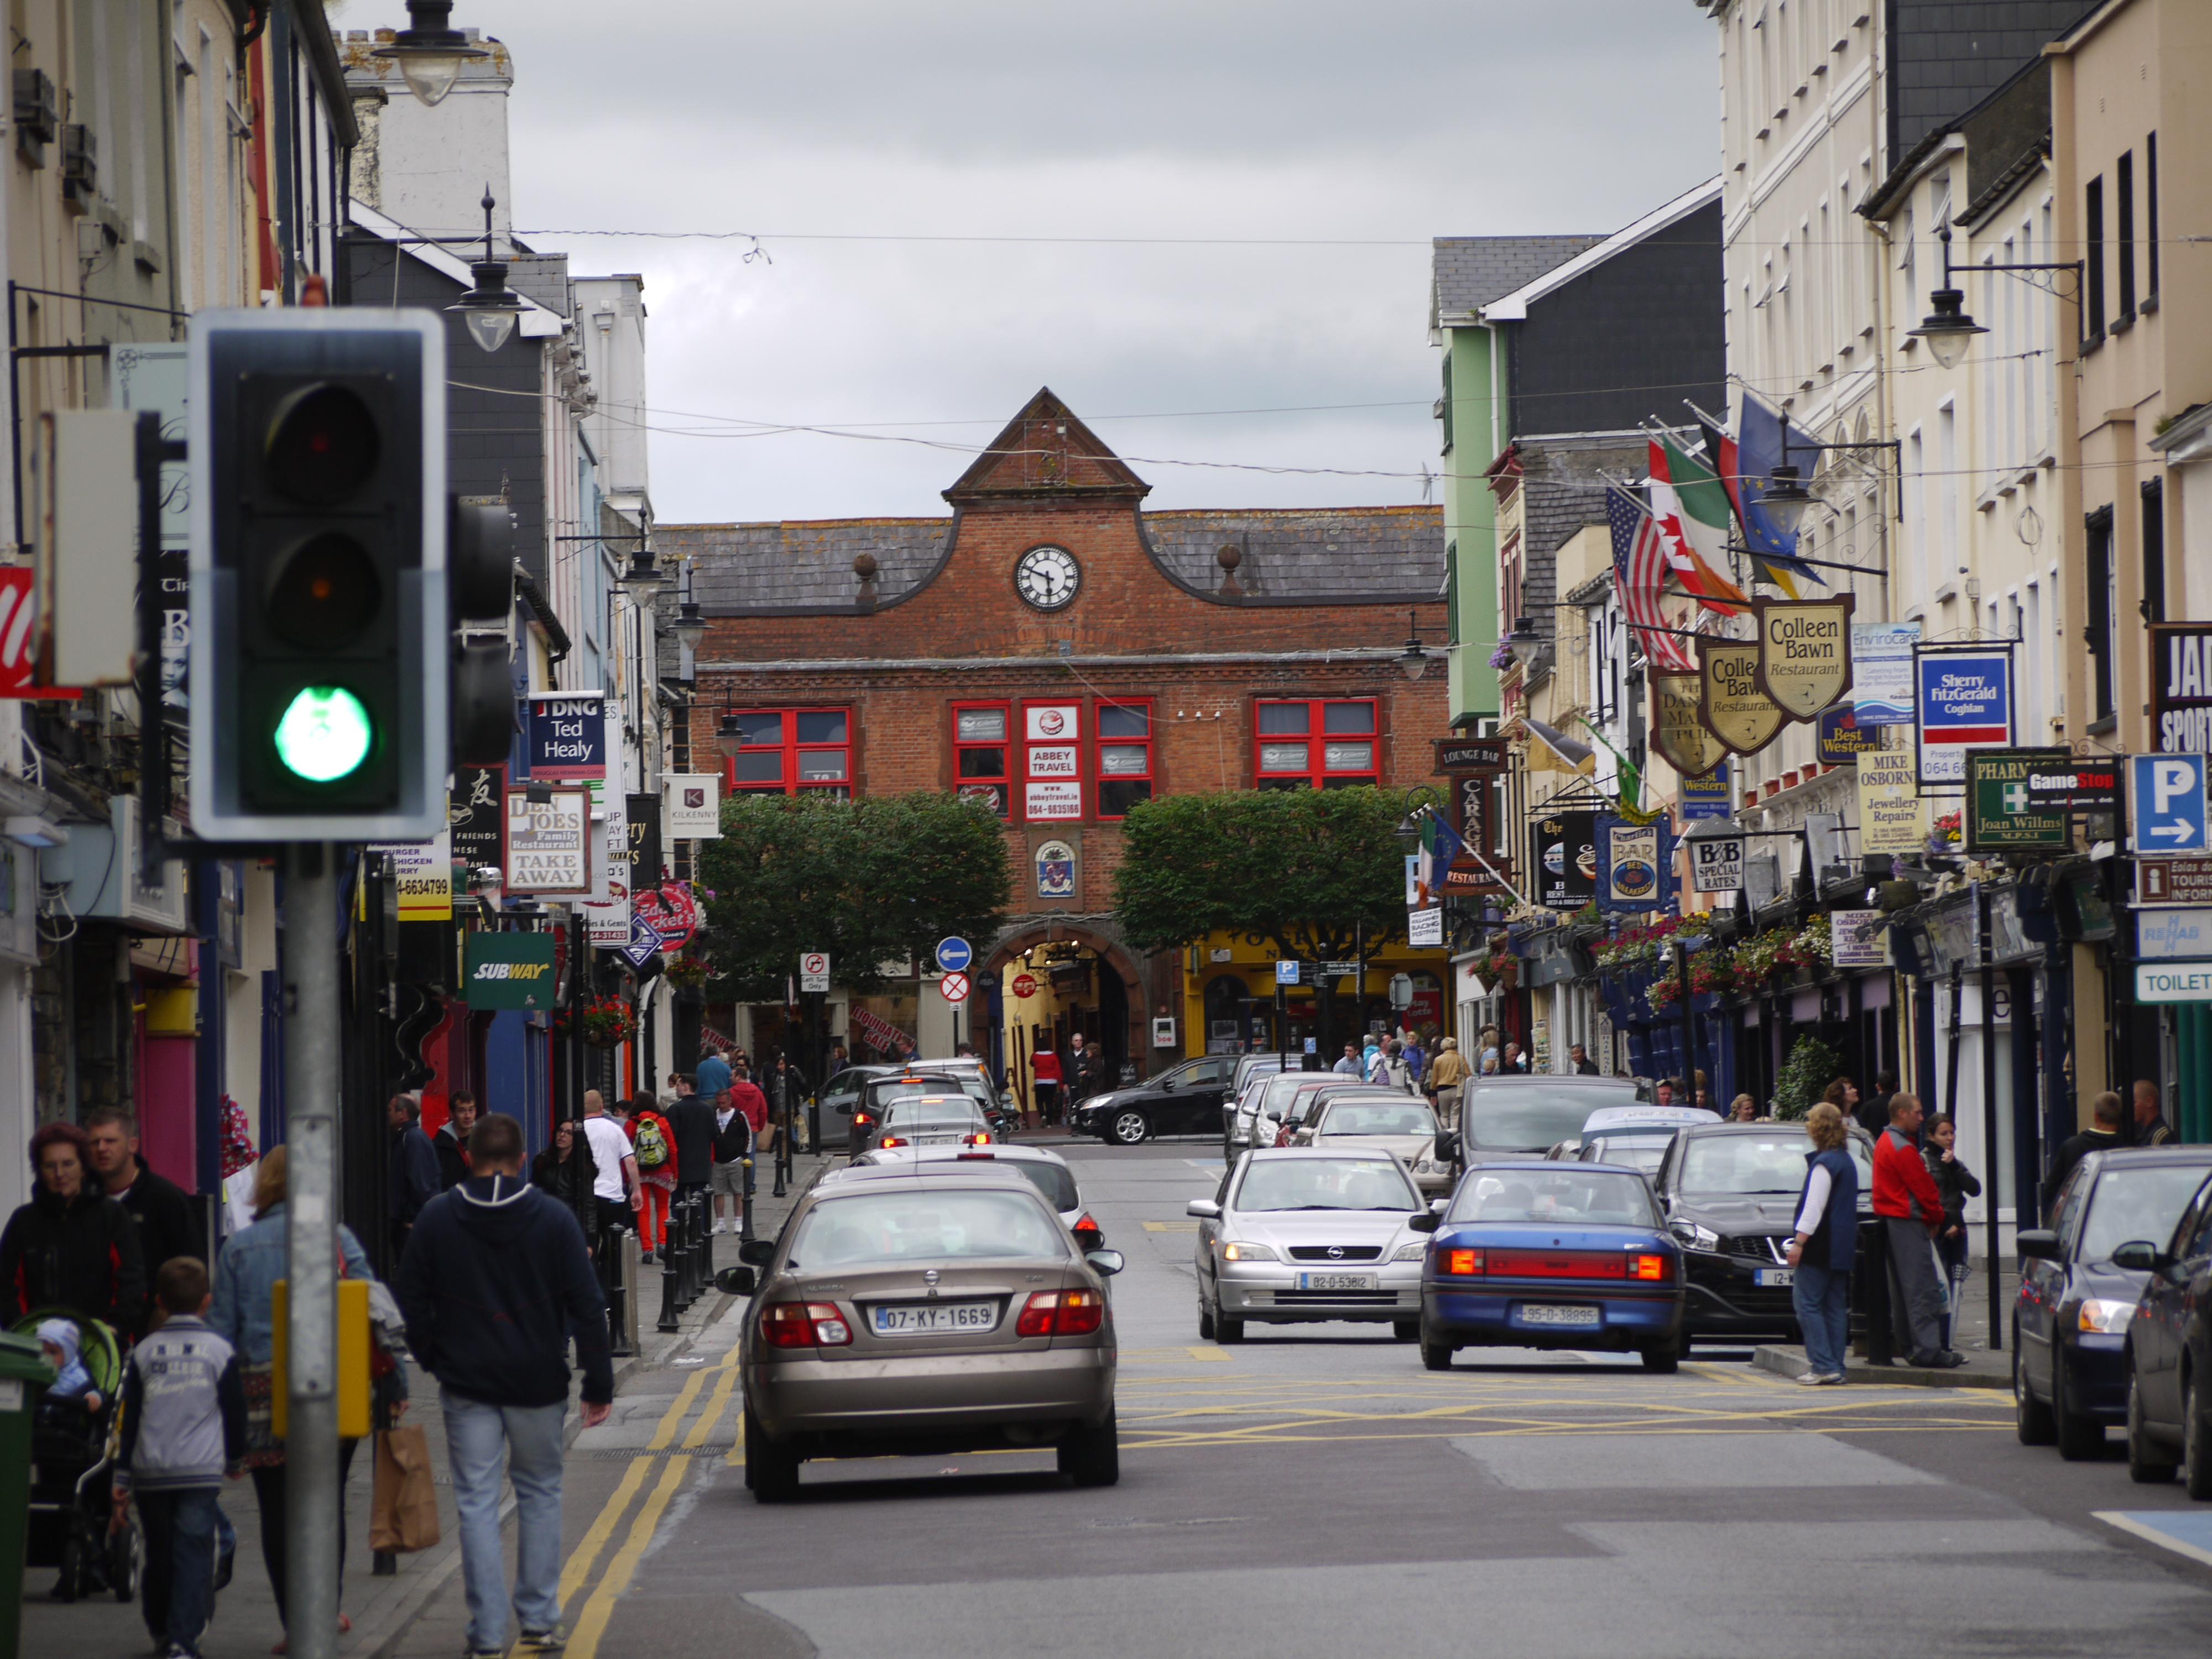 10 Best Killarney Hotels, Ireland (From $50) - potteriespowertransmission.co.uk